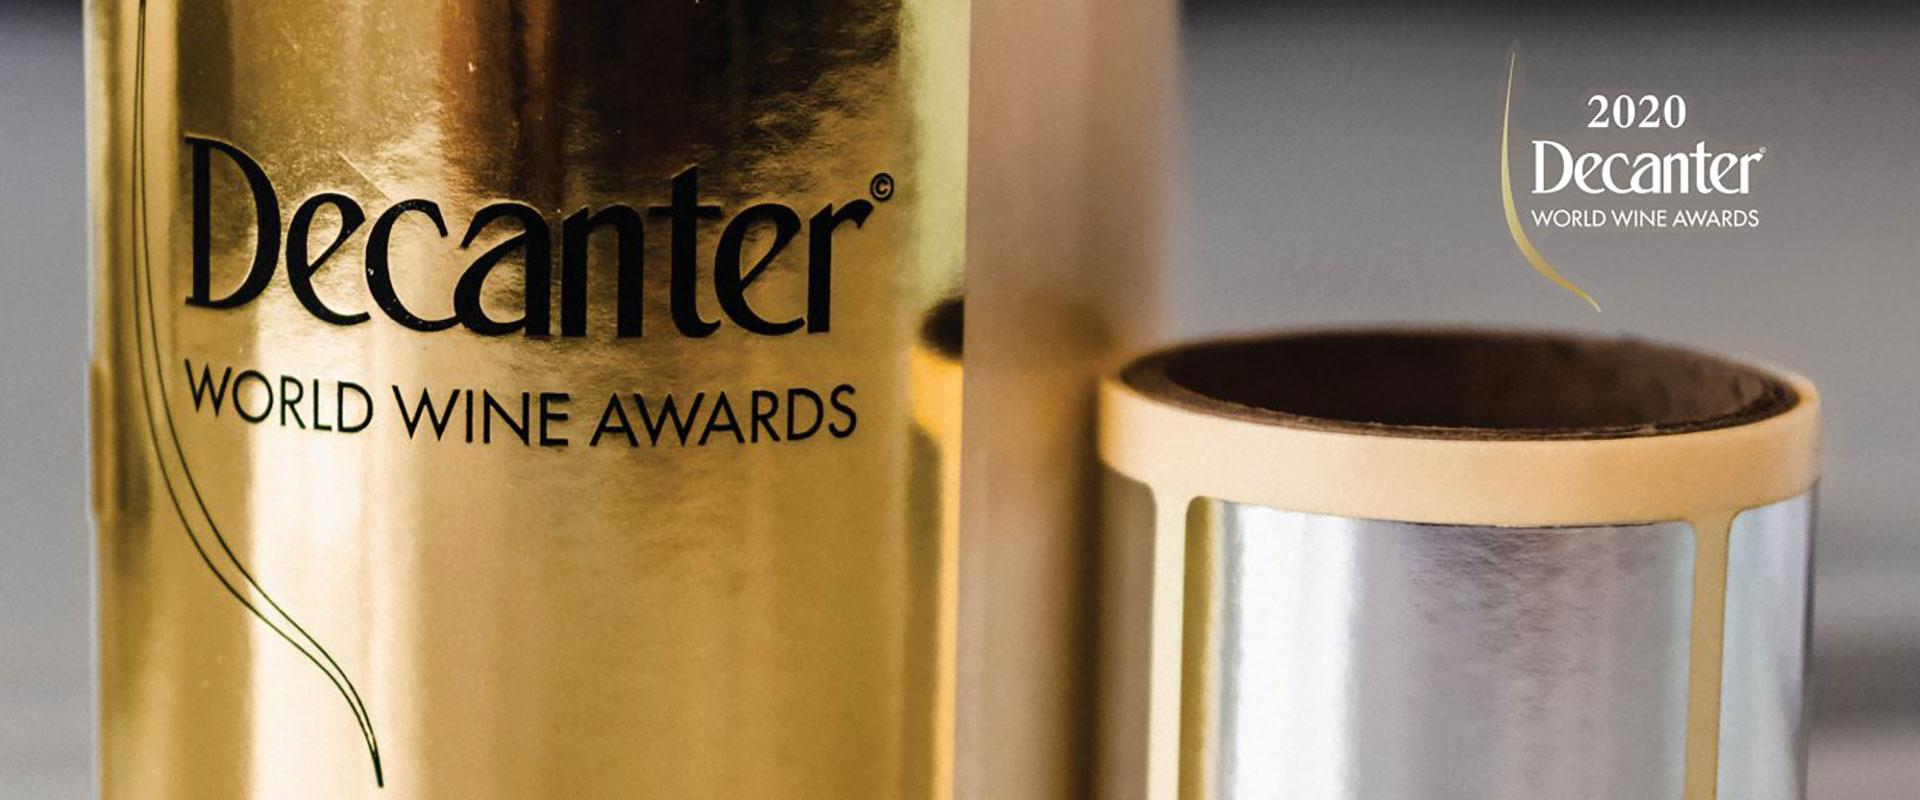 Decanter Wine Awards 2020